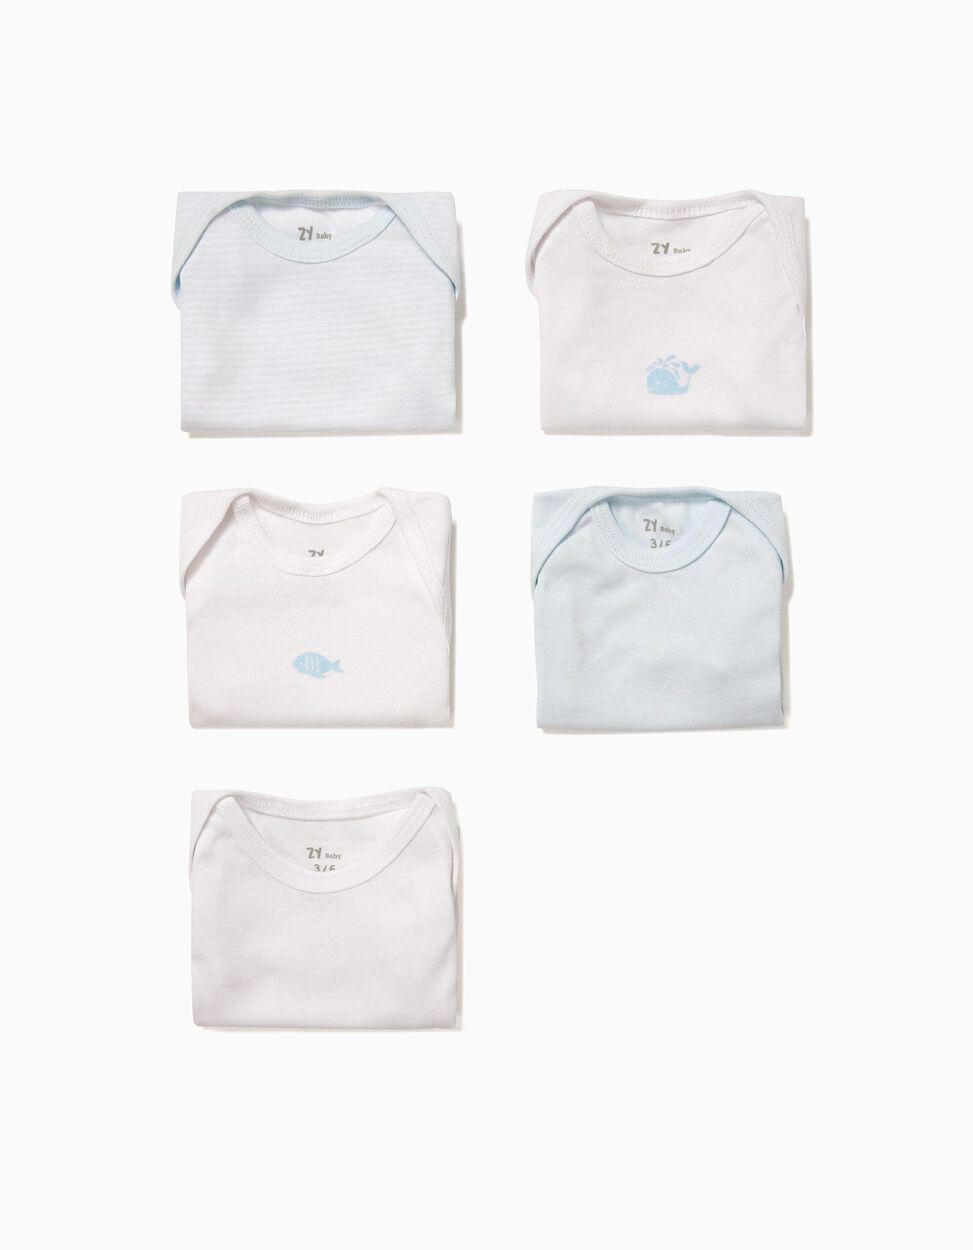 Pack 5 Bodies Azul e Branco